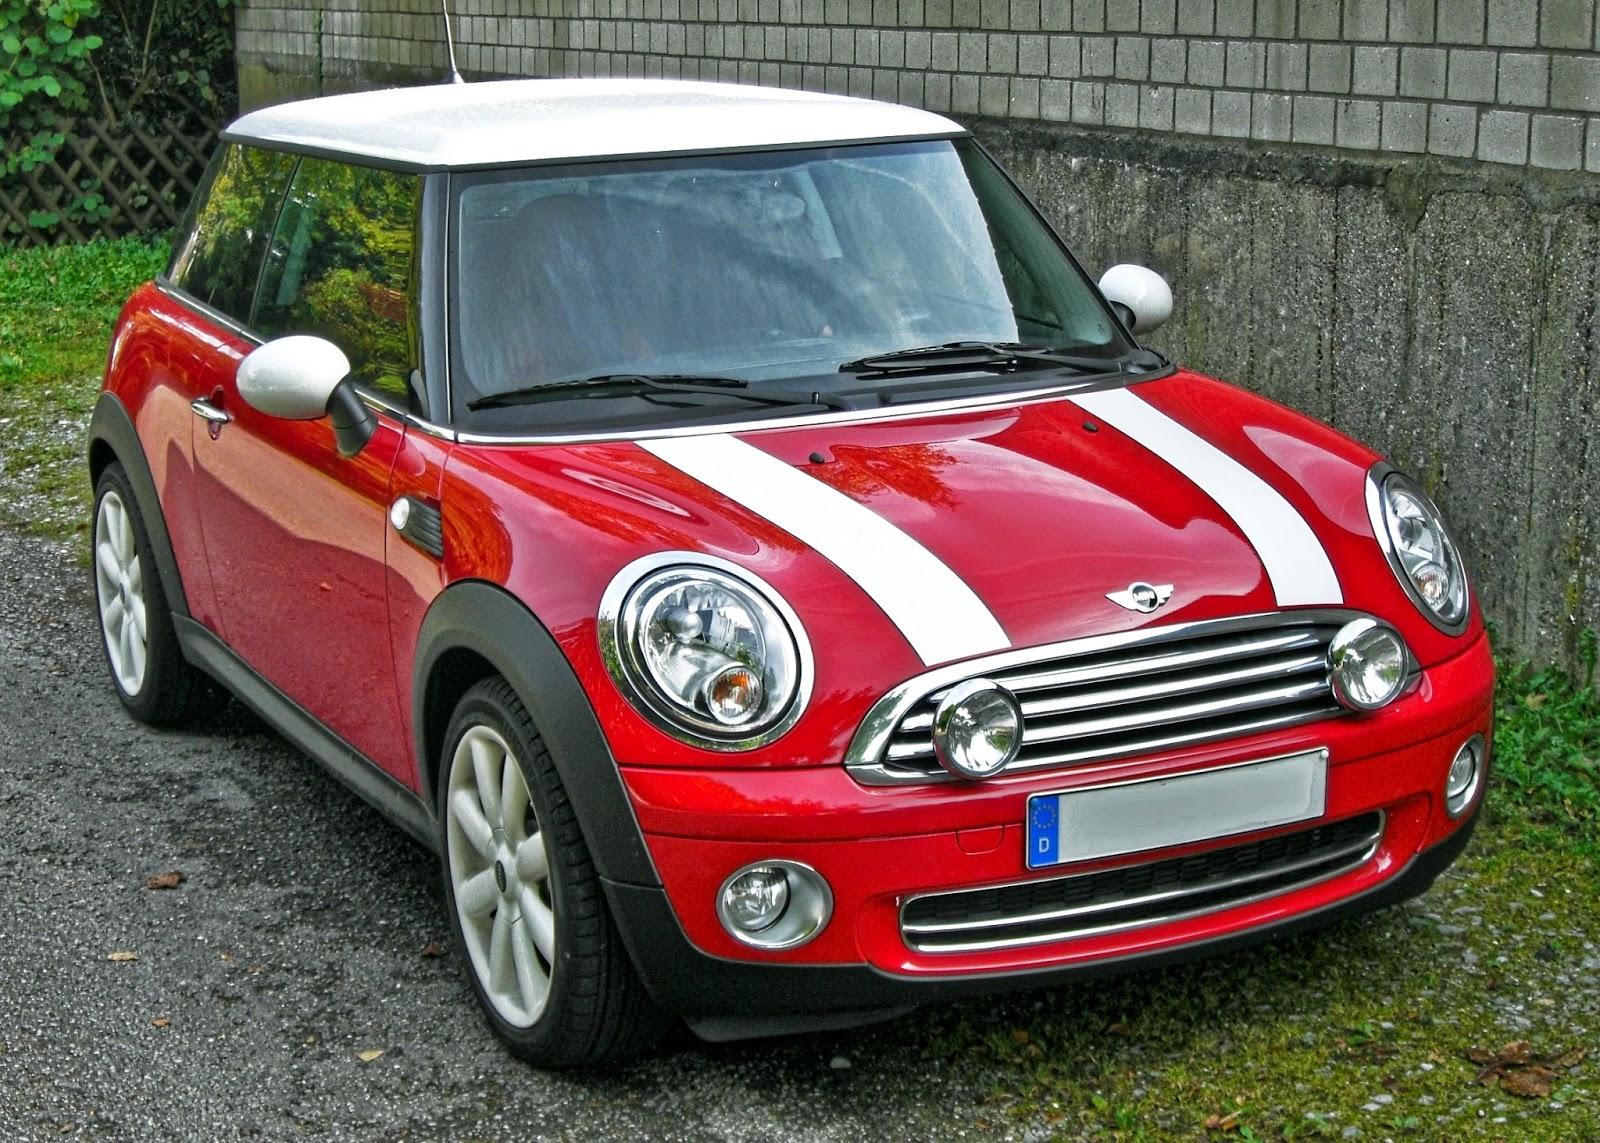 The British Sports Car